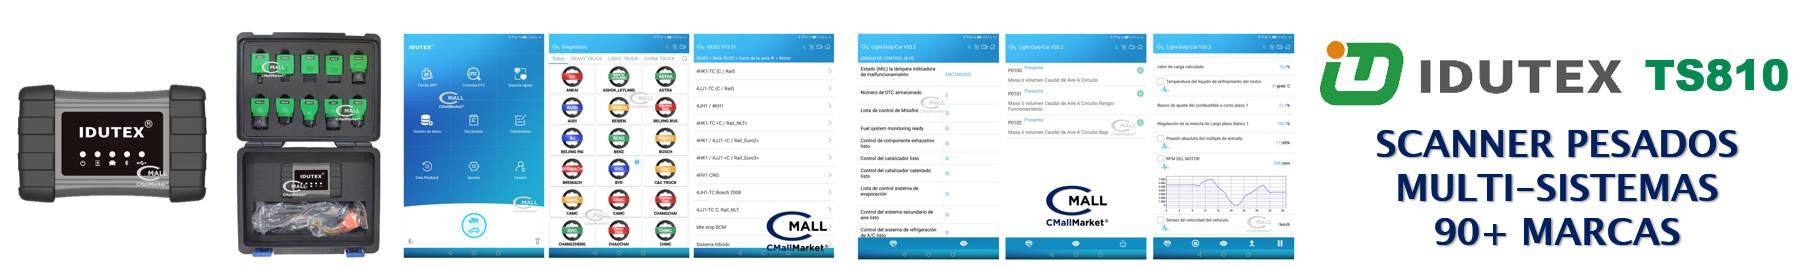 IDUTEX TS810 MULTIMARCA MULTI-SISTEMAS VEHICULOS PESADOS CMALL MARKET